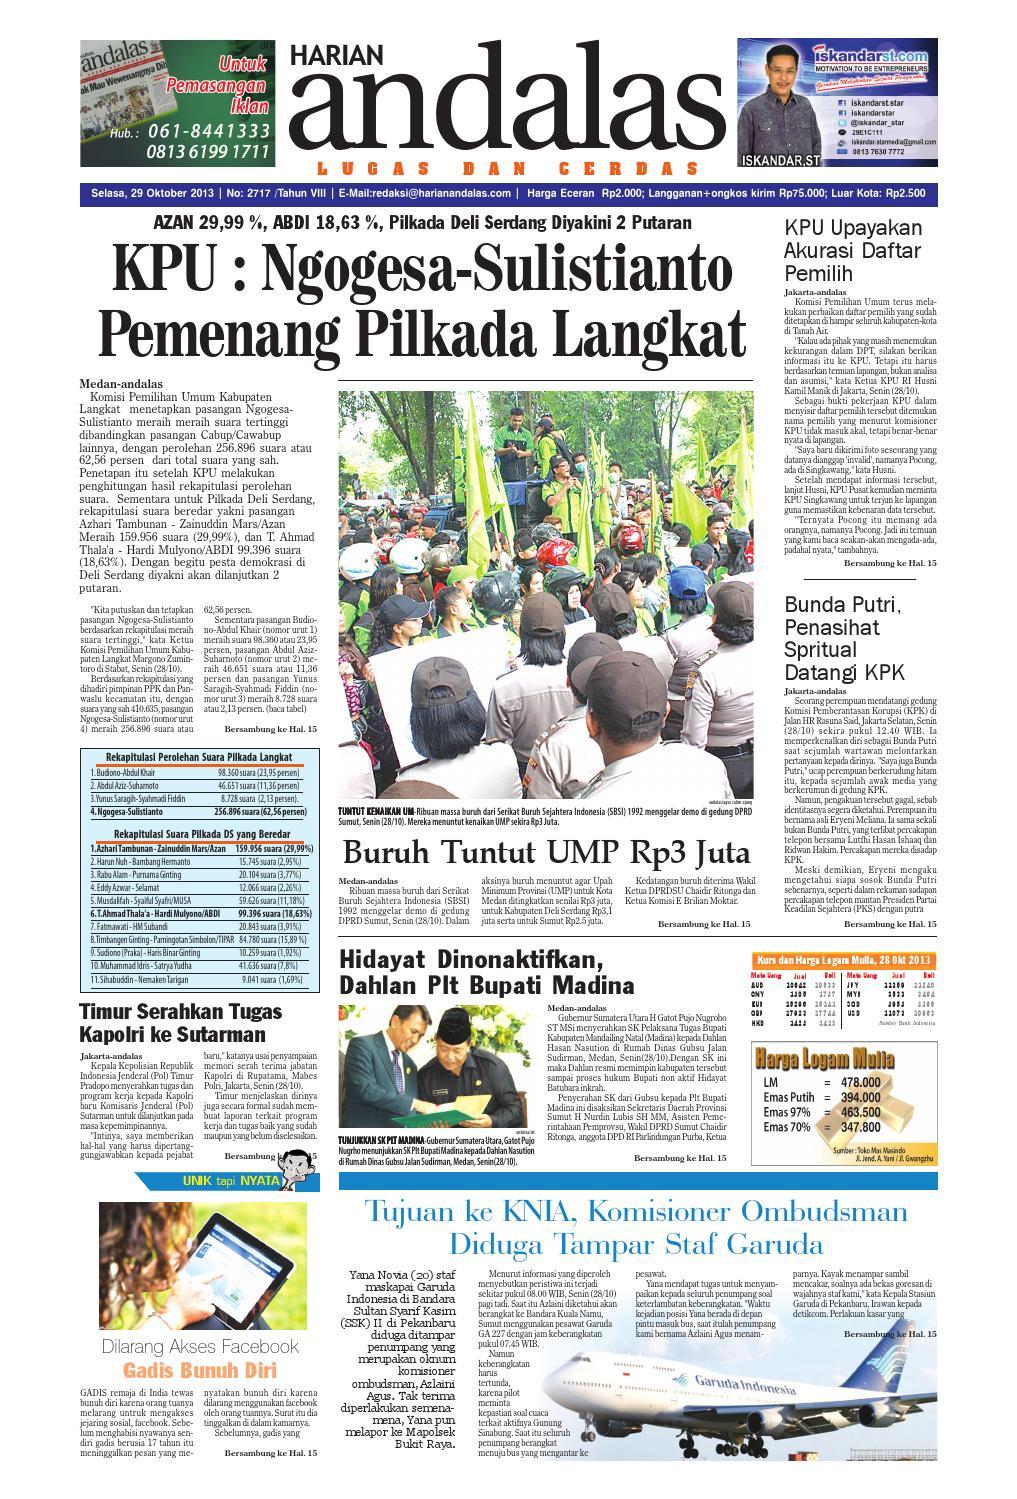 a02427eafb49d Epaper andalas edisi selasa 29 oktober 2013 by media andalas - issuu